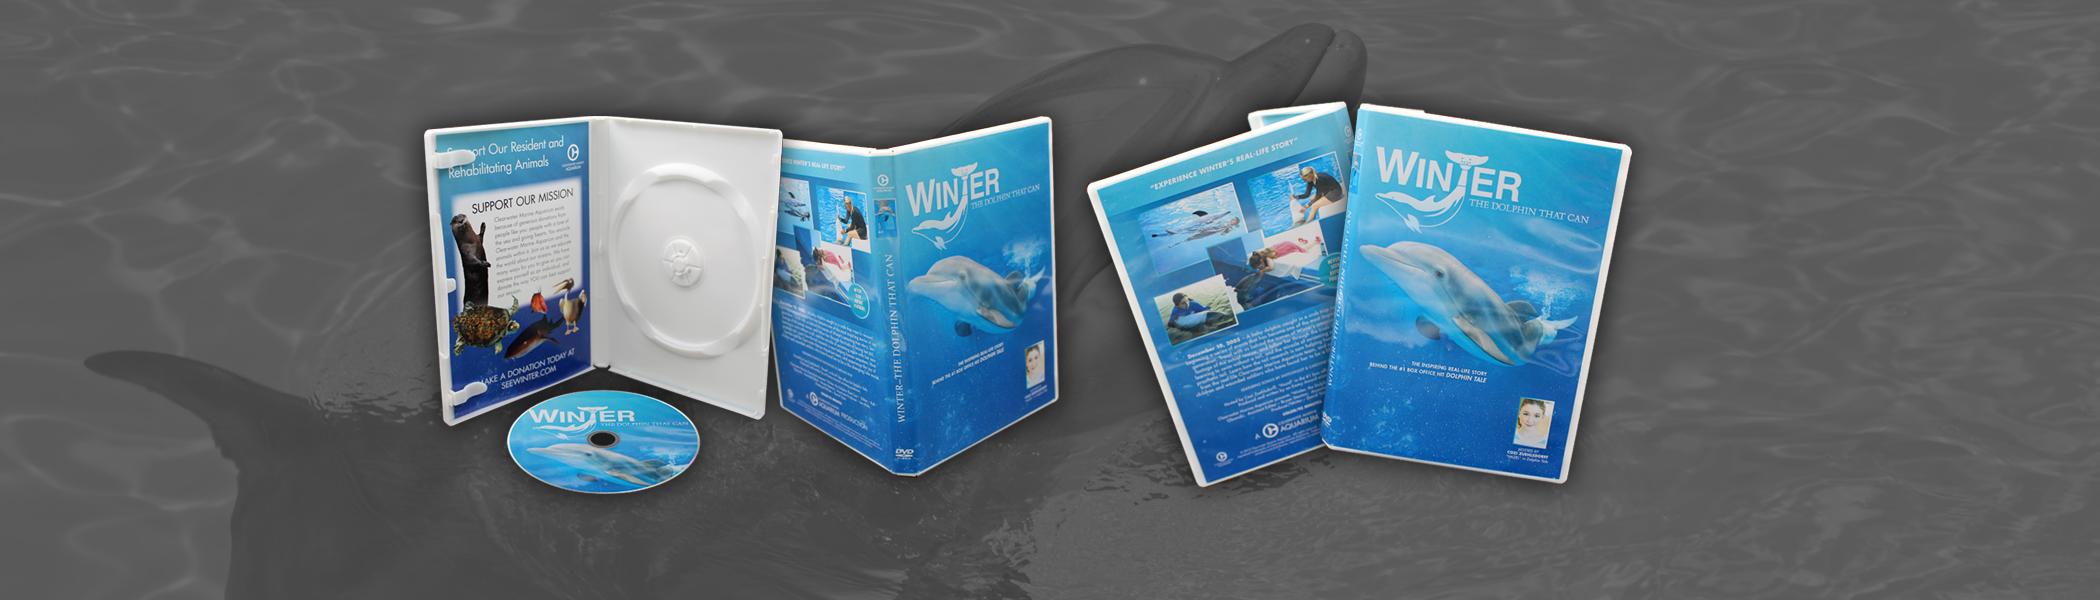 Discs in White DVD Case with insert